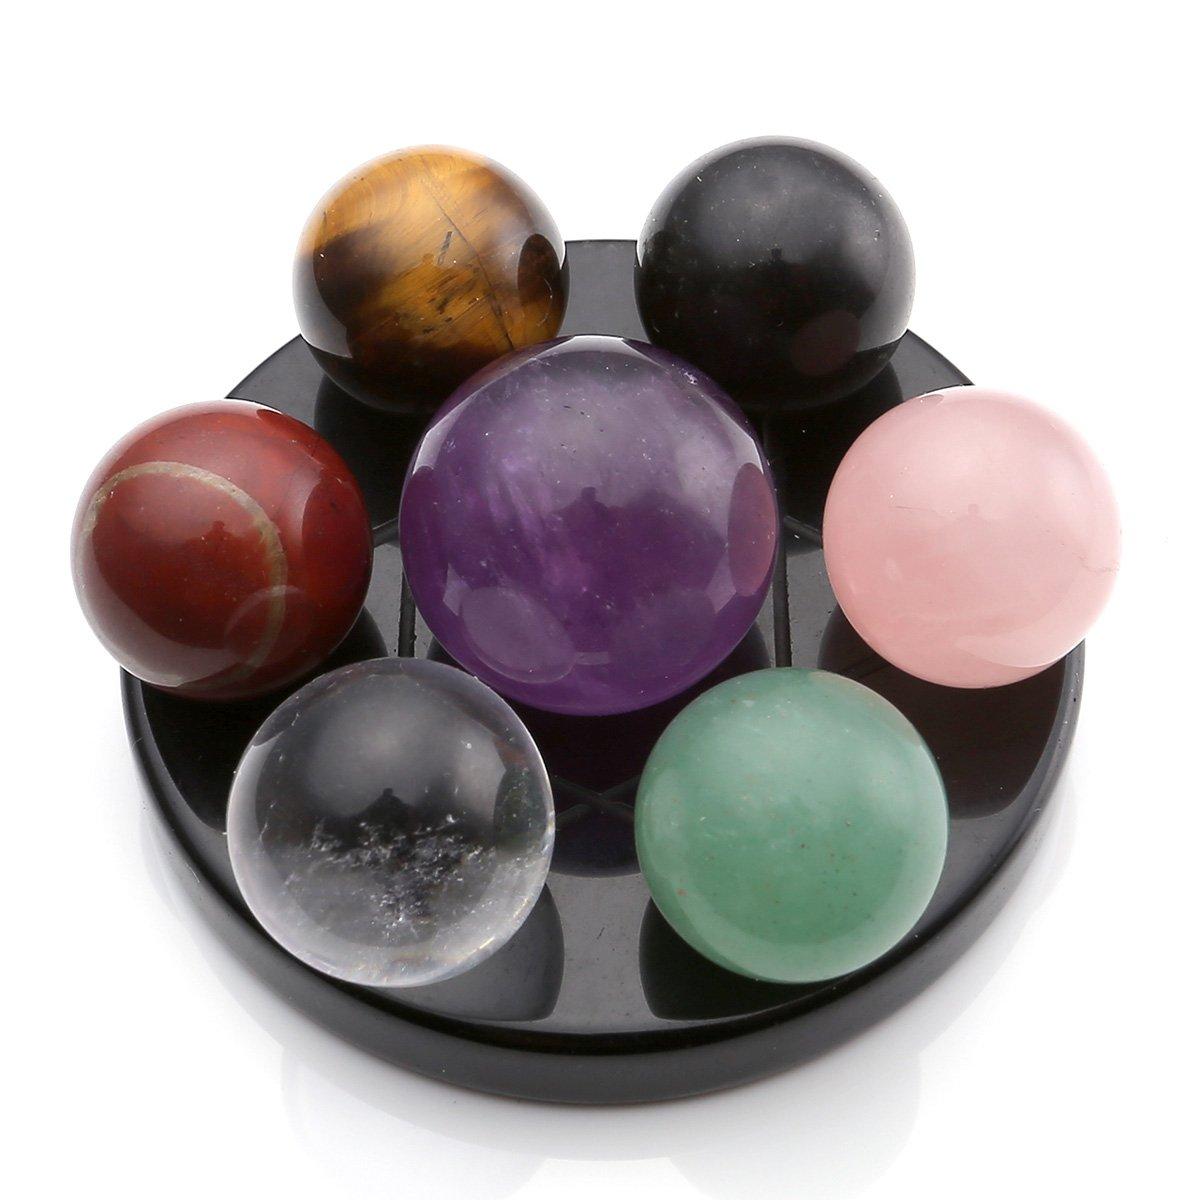 CrystalTears Seven Star Group Amethyst Chakra Sphere Crystal Balls with Black Obsidian Base Reiki Healing